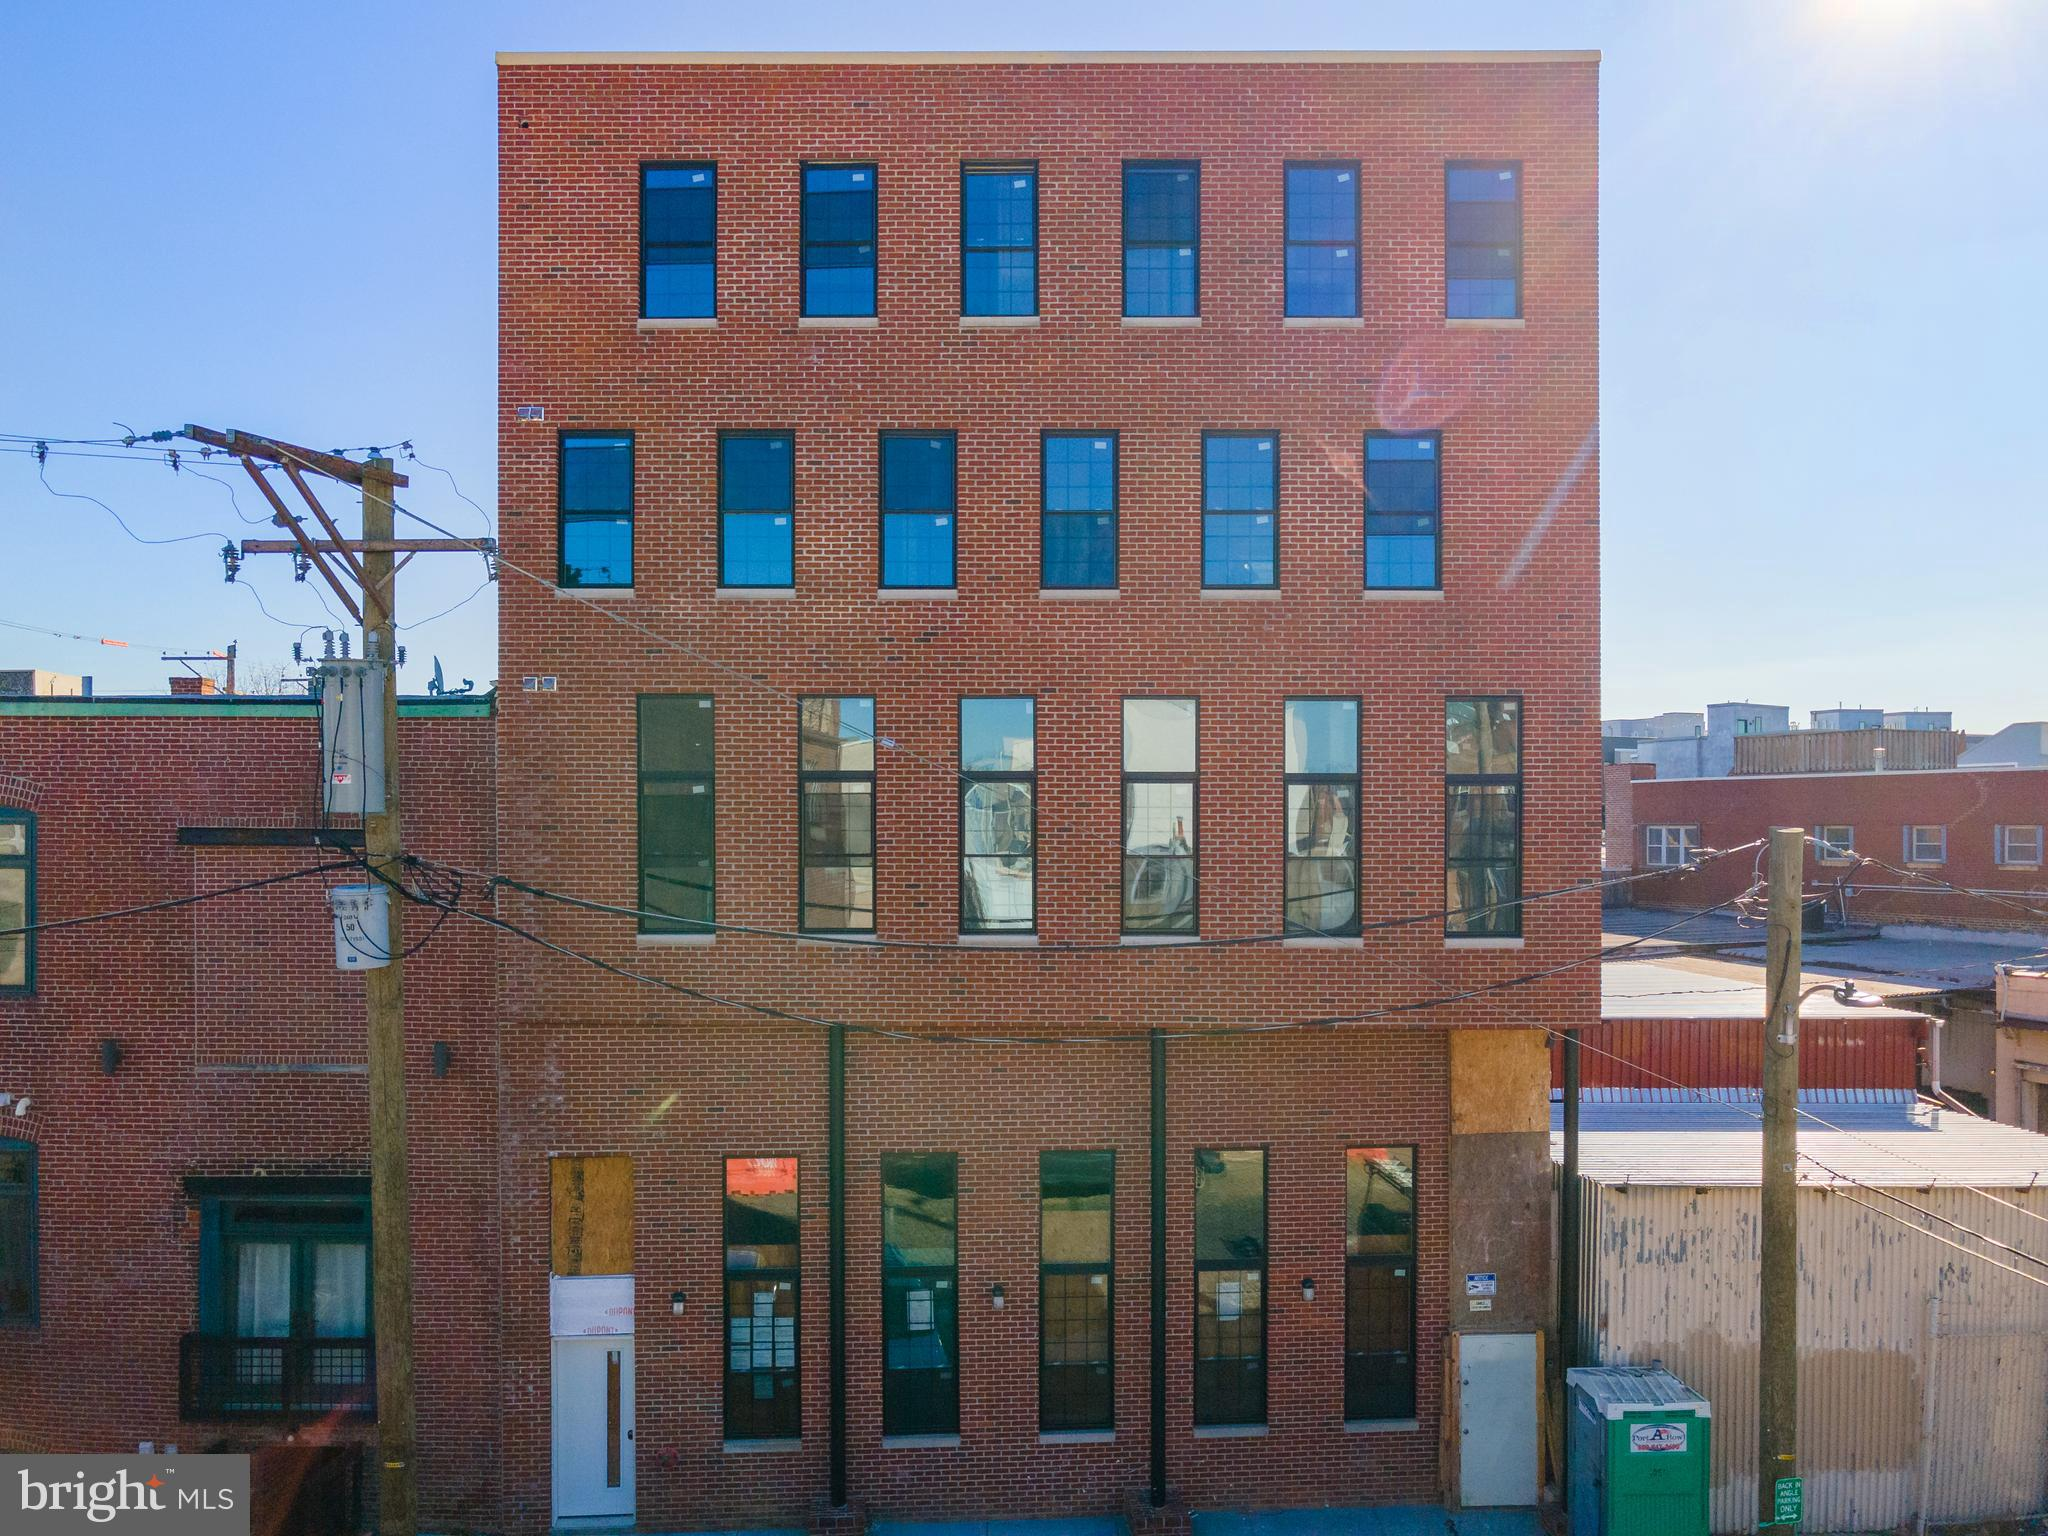 2045-49 Trenton Ave, Philadelphia, PA, 19125